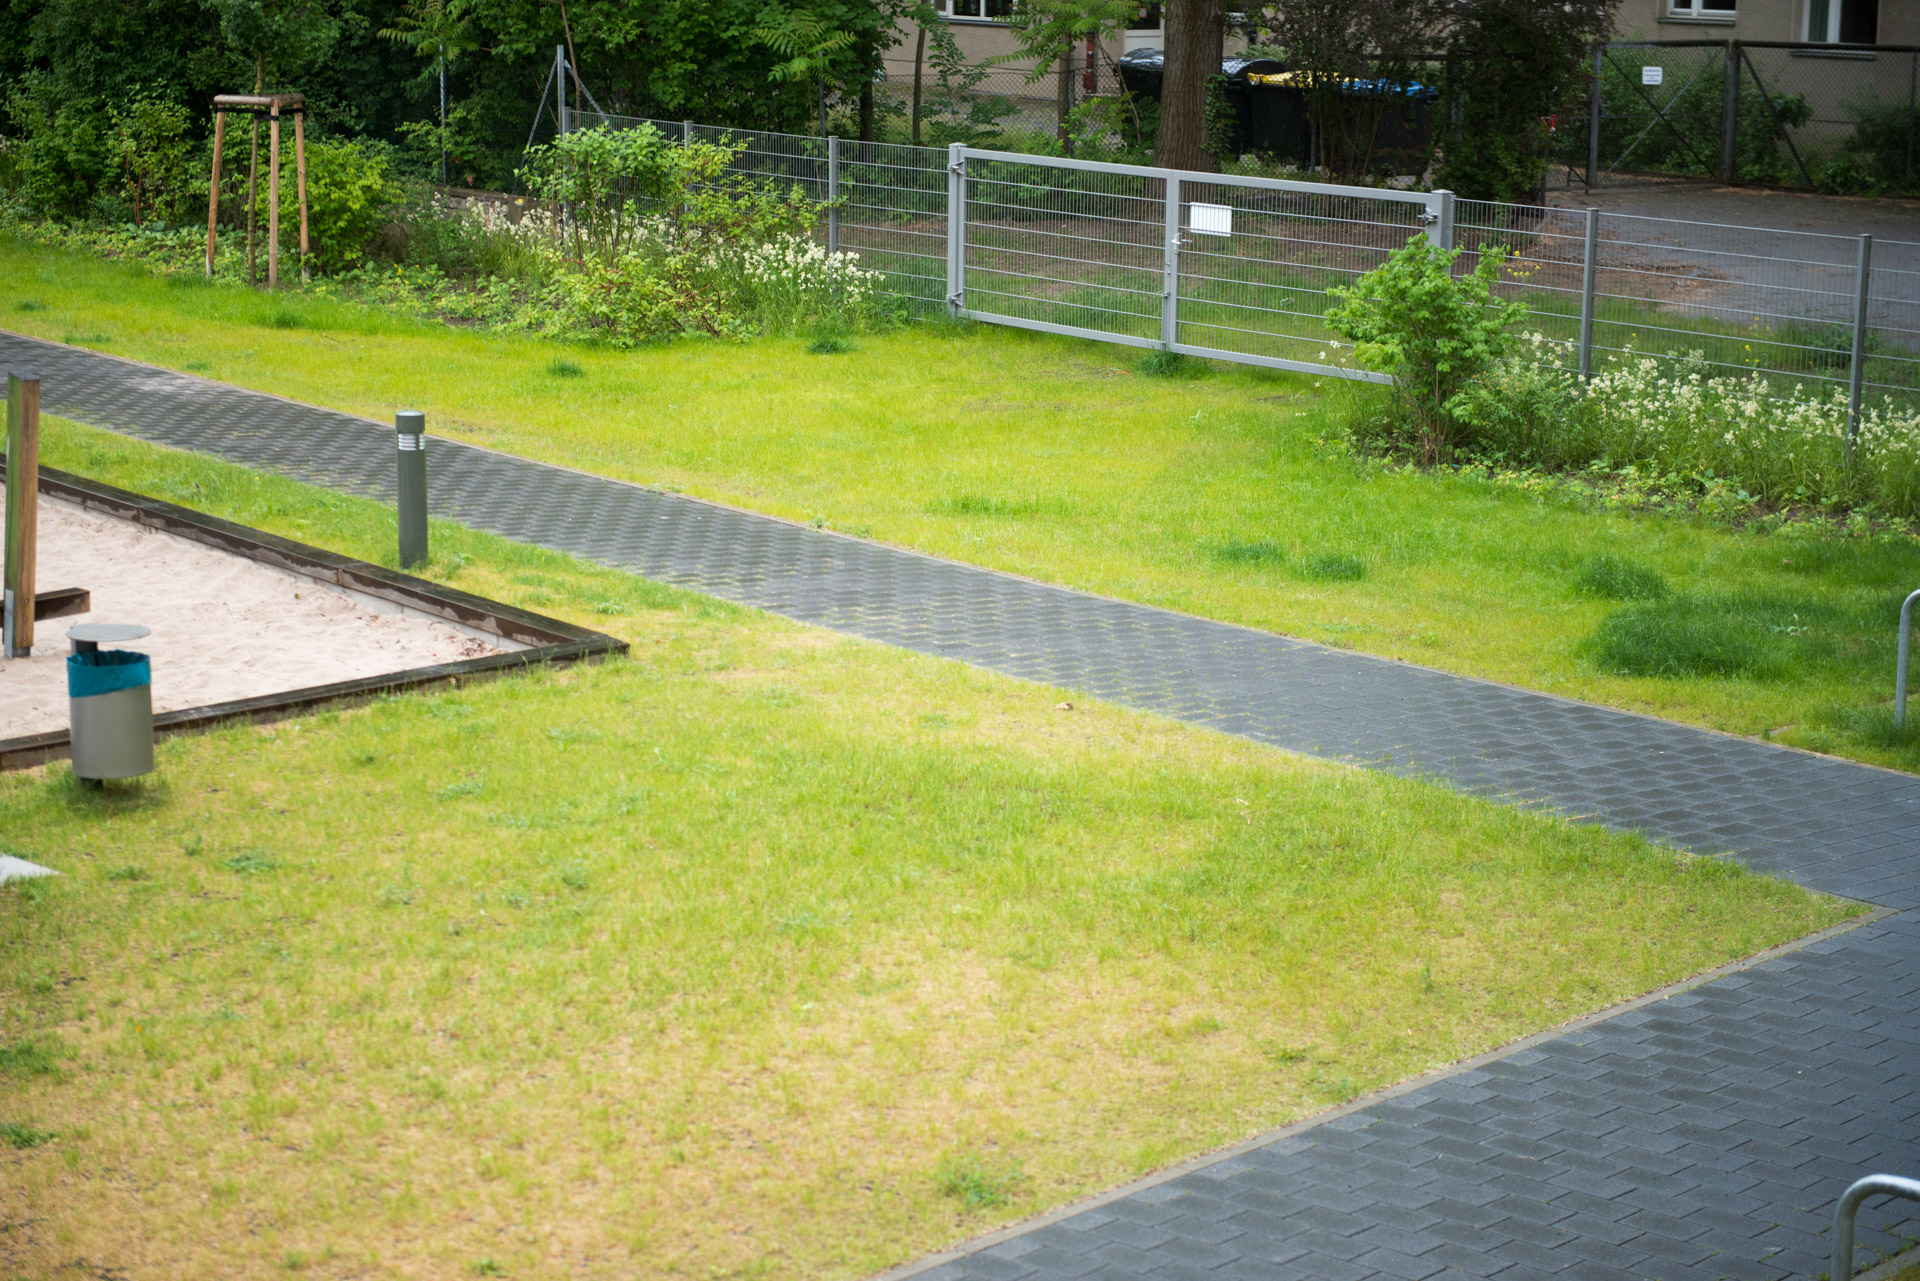 Innenhof mit Rasengitterflächen